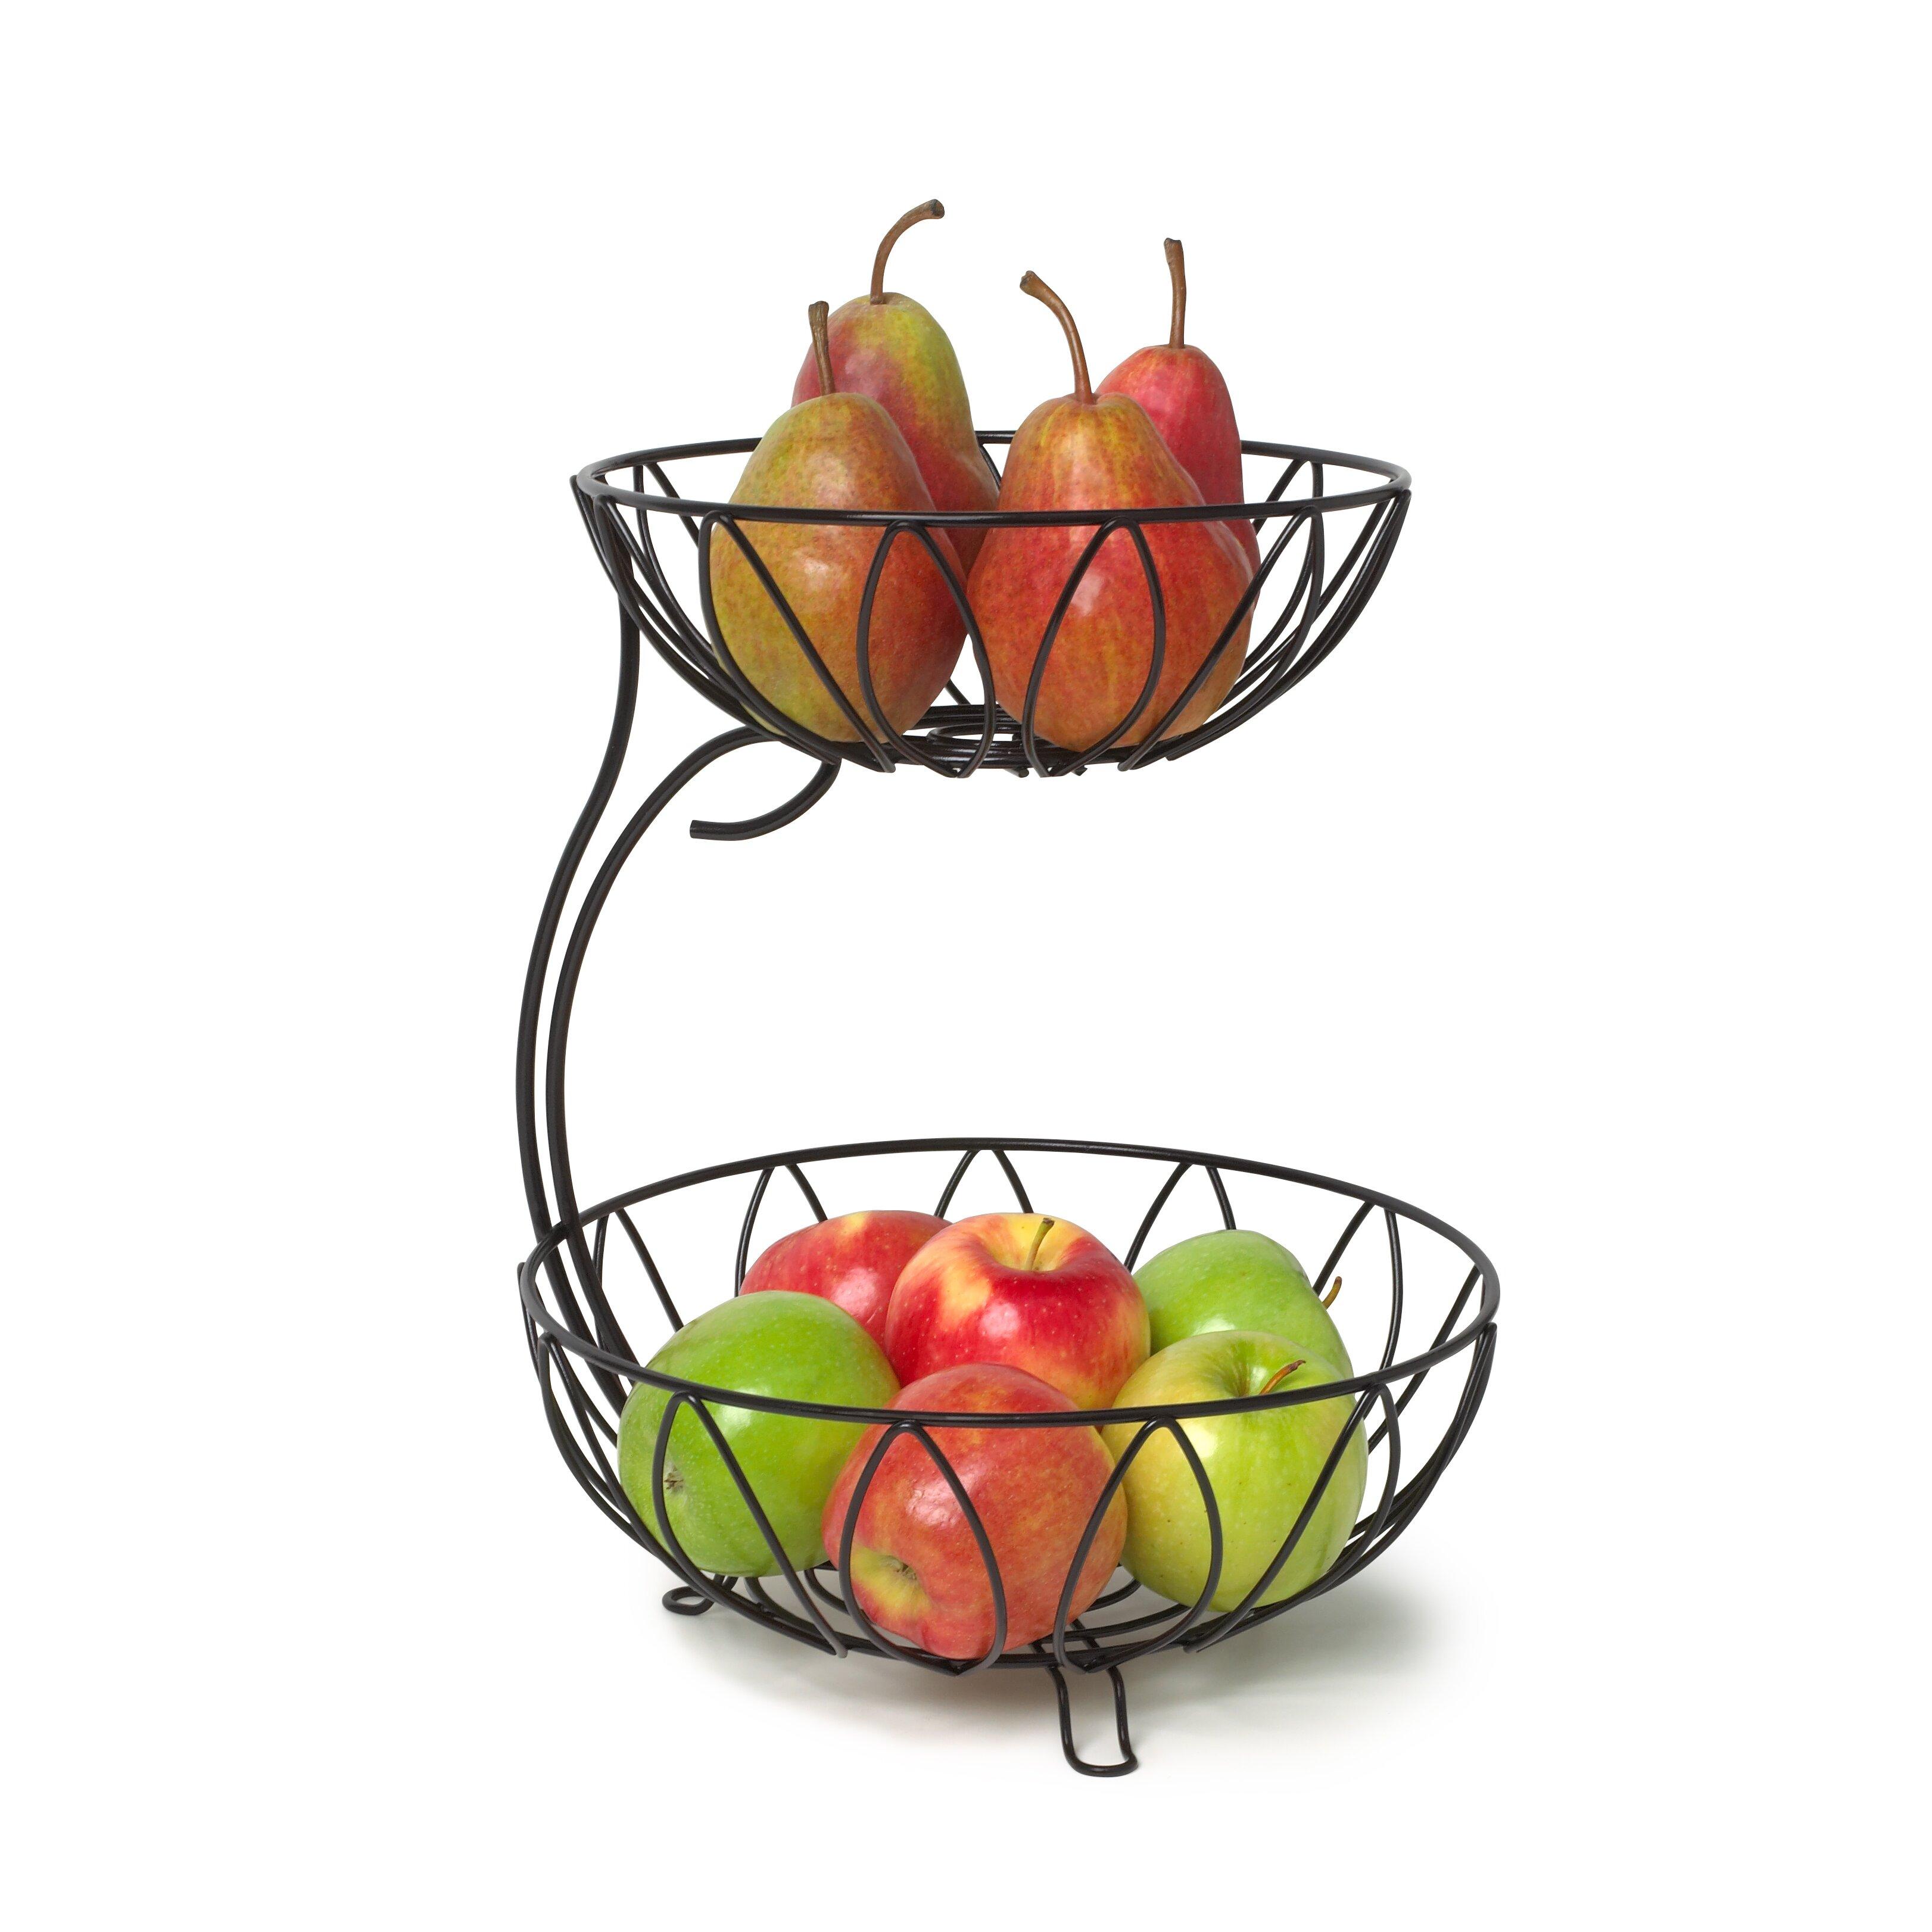 Spectrum diversified leaf arched 2 tier fruit bowl reviews wayfair - Tiered fruit bowl ...